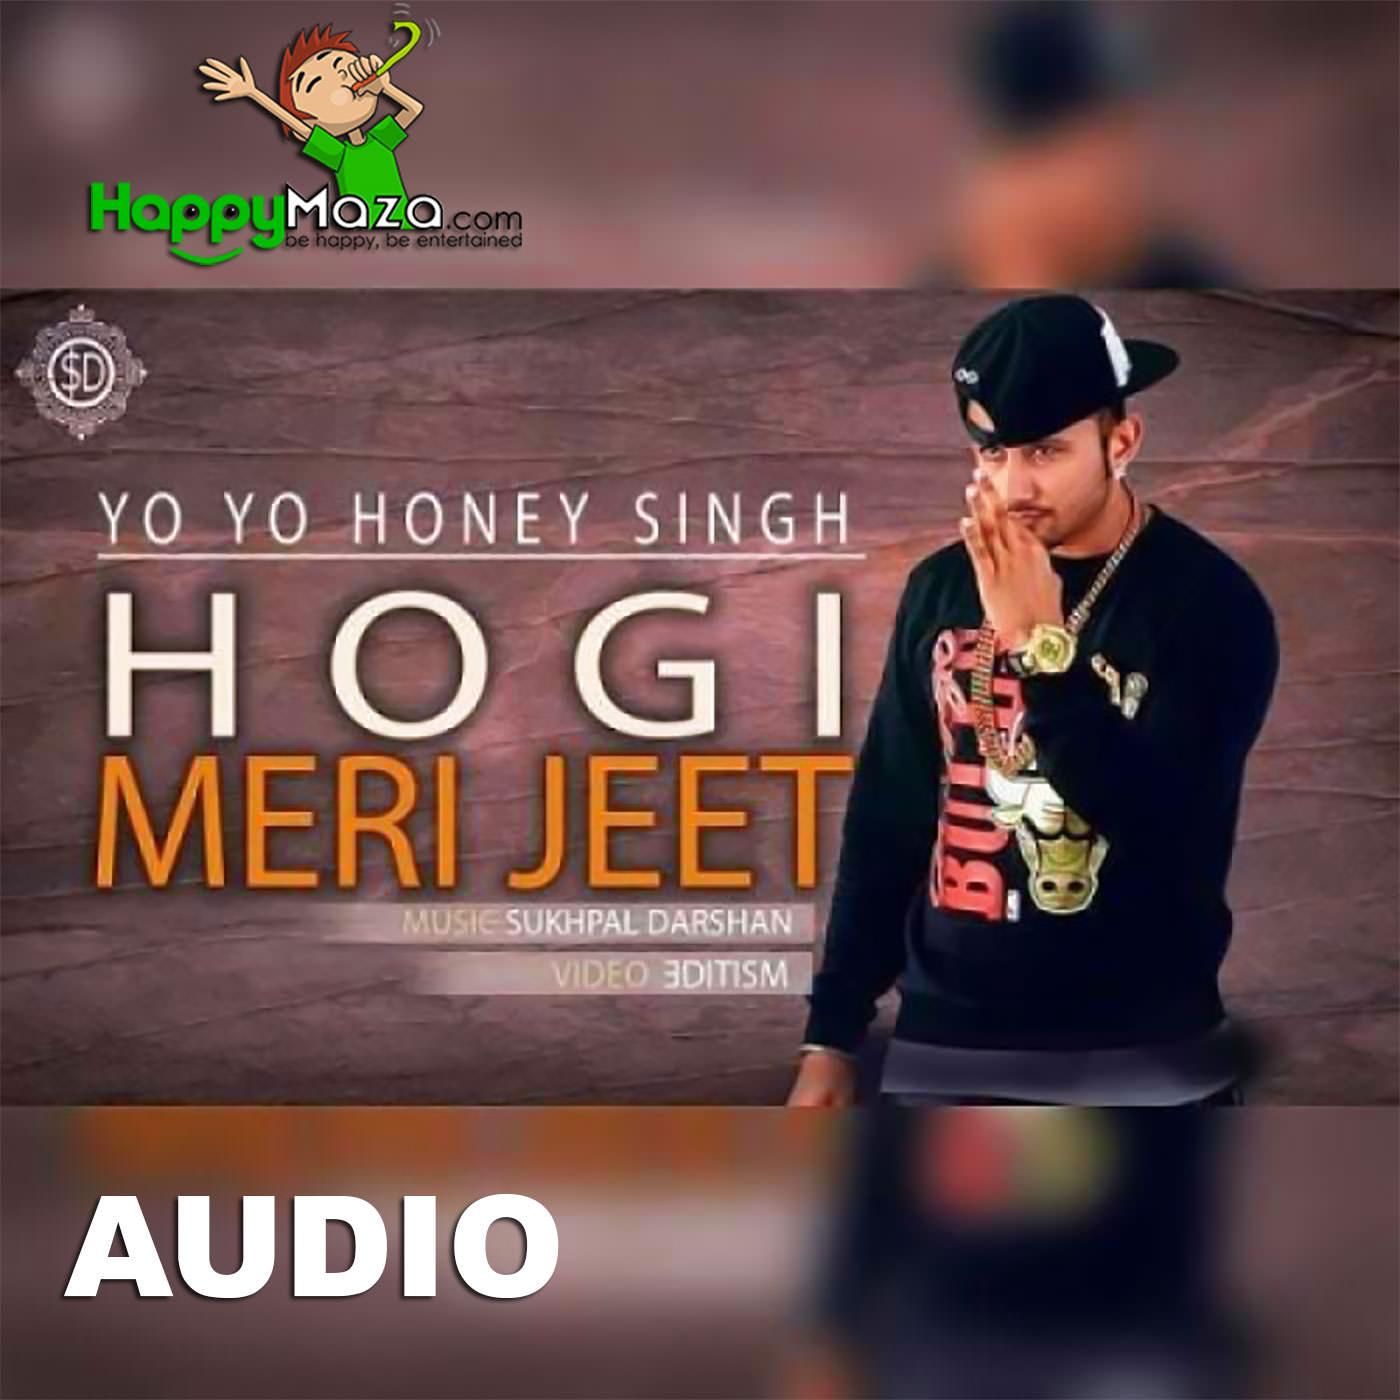 Koi Puche Mere Dil Pe Mp3 Song Download: Hogi Meri Jeet Lyrics